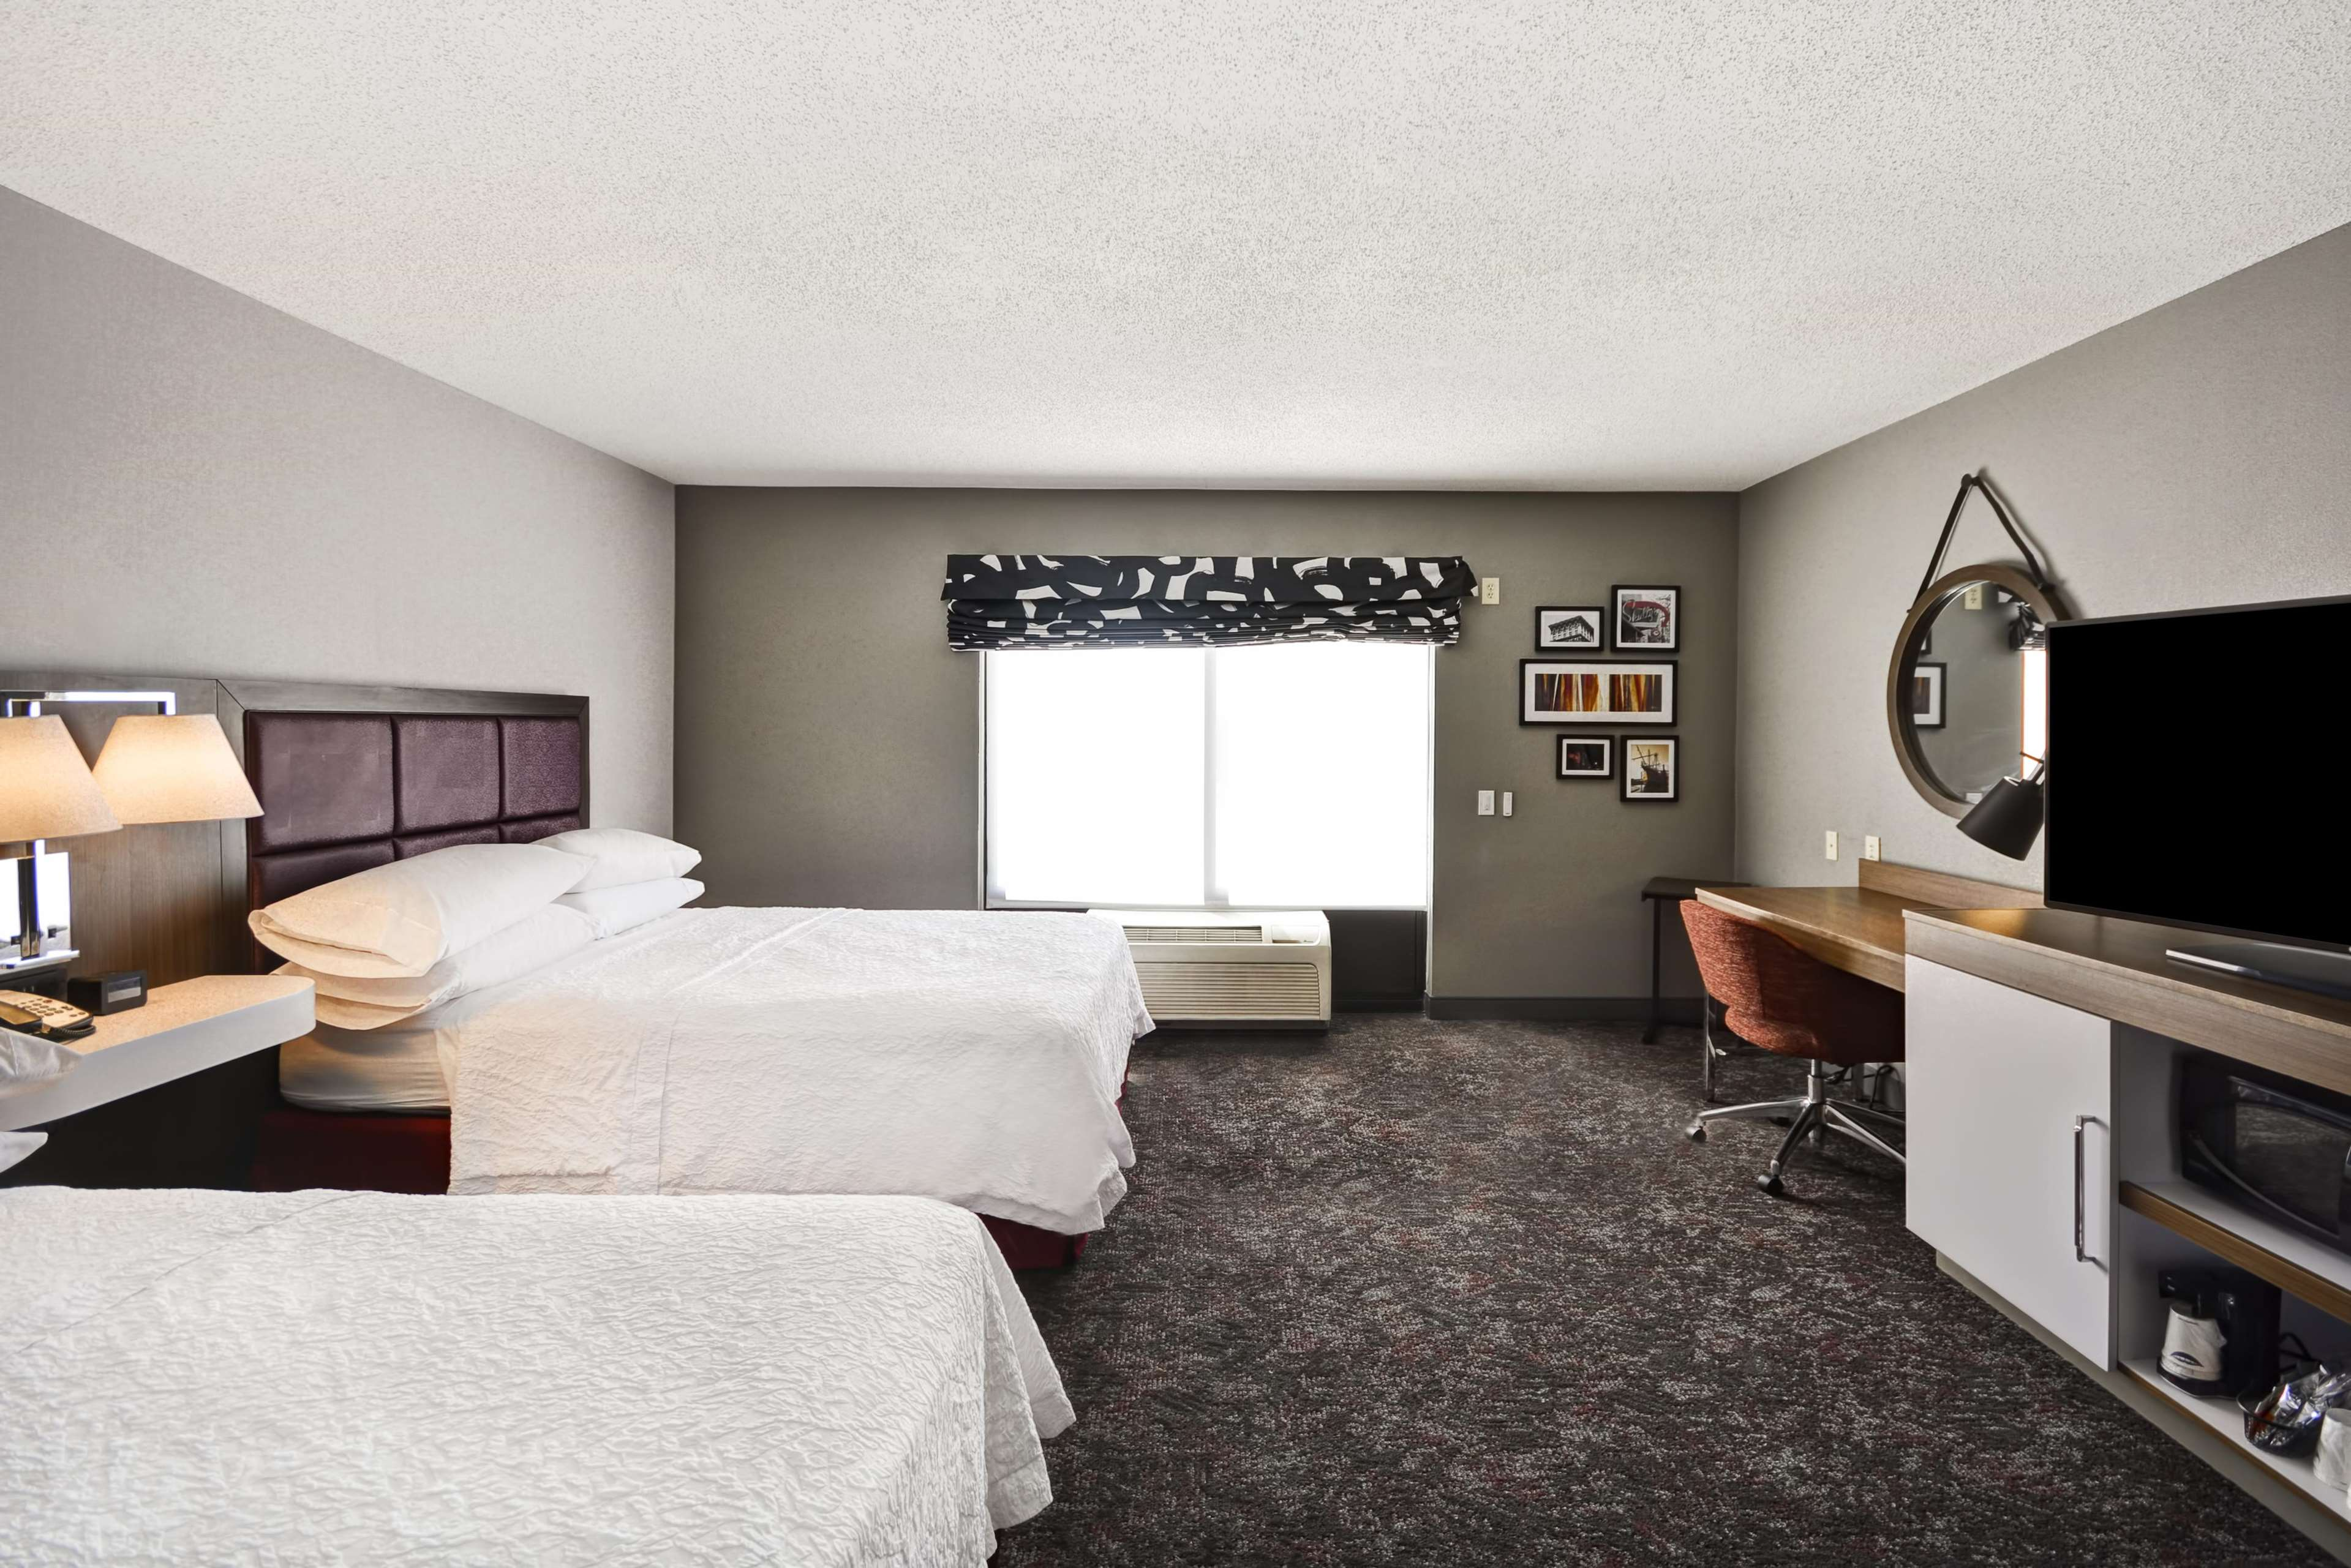 Hampton Inn & Suites Columbus-Easton Area image 40